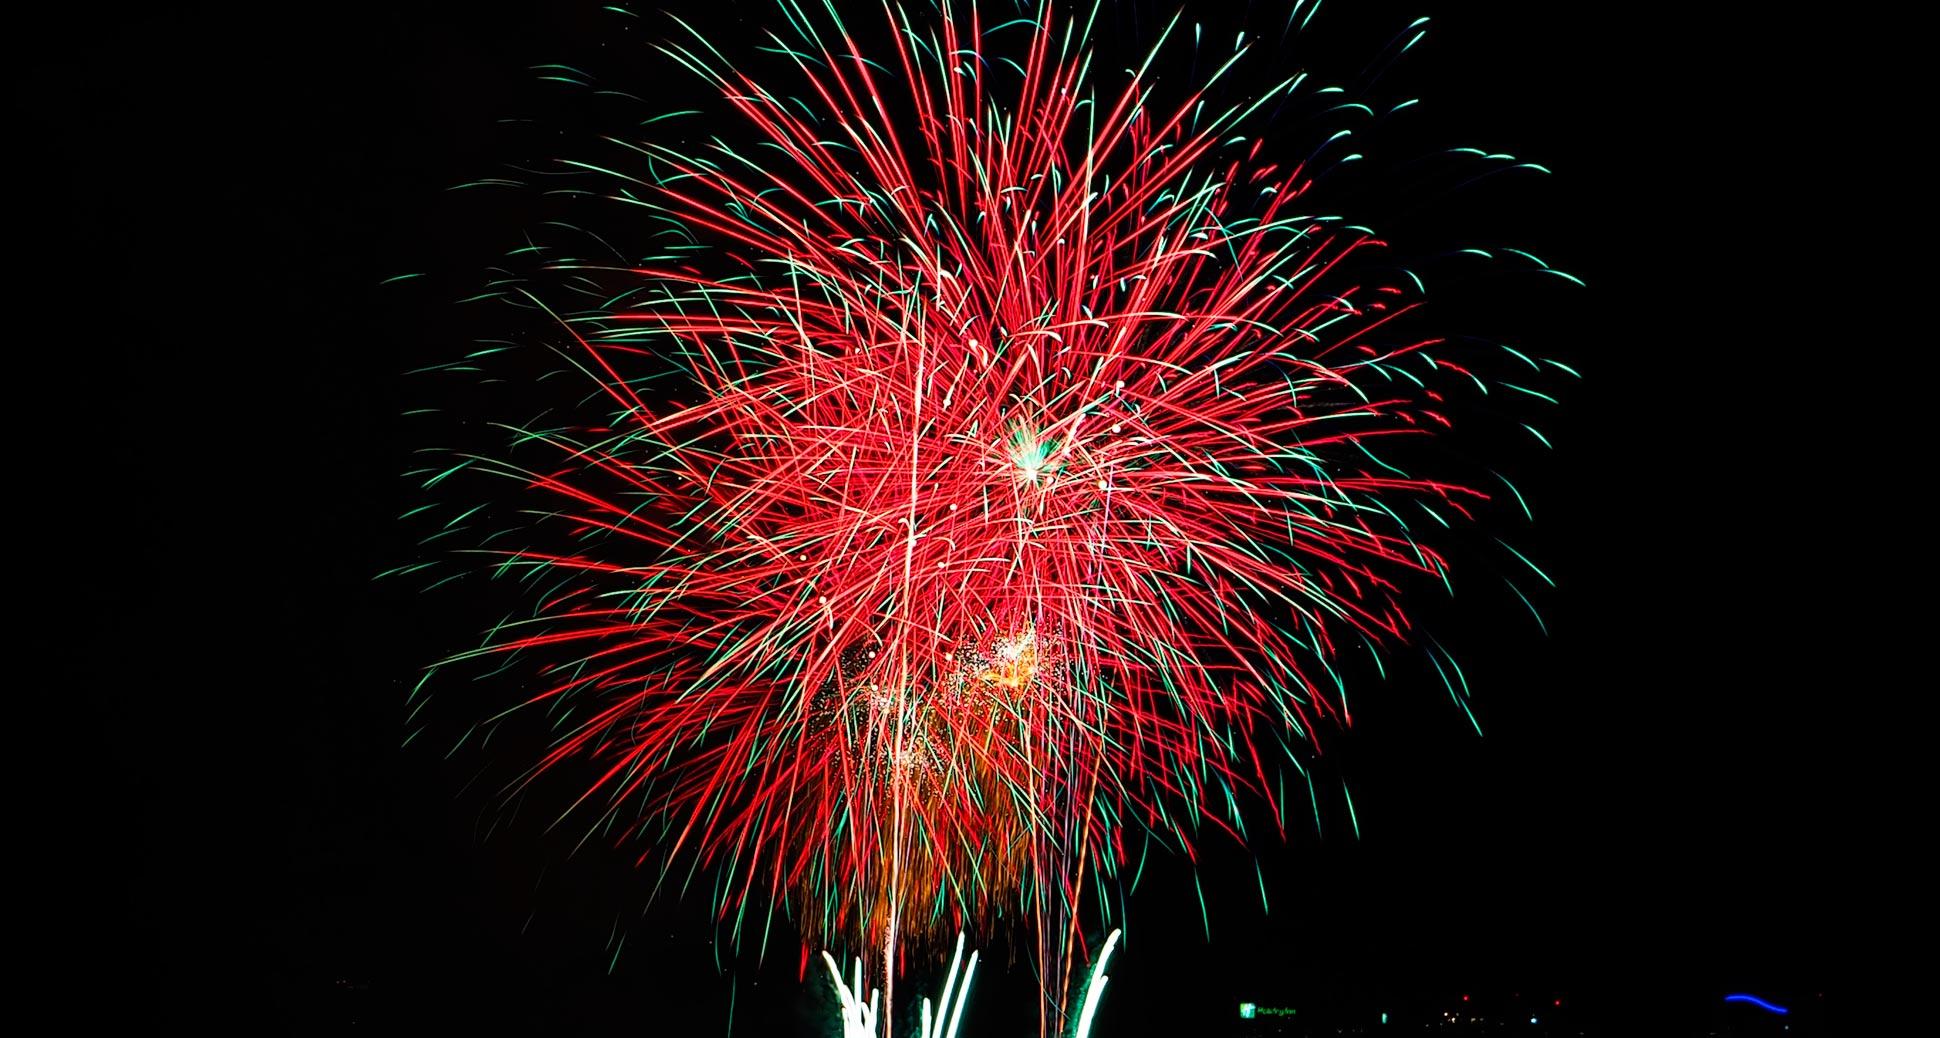 Celebrating vancouver fireworks 2016